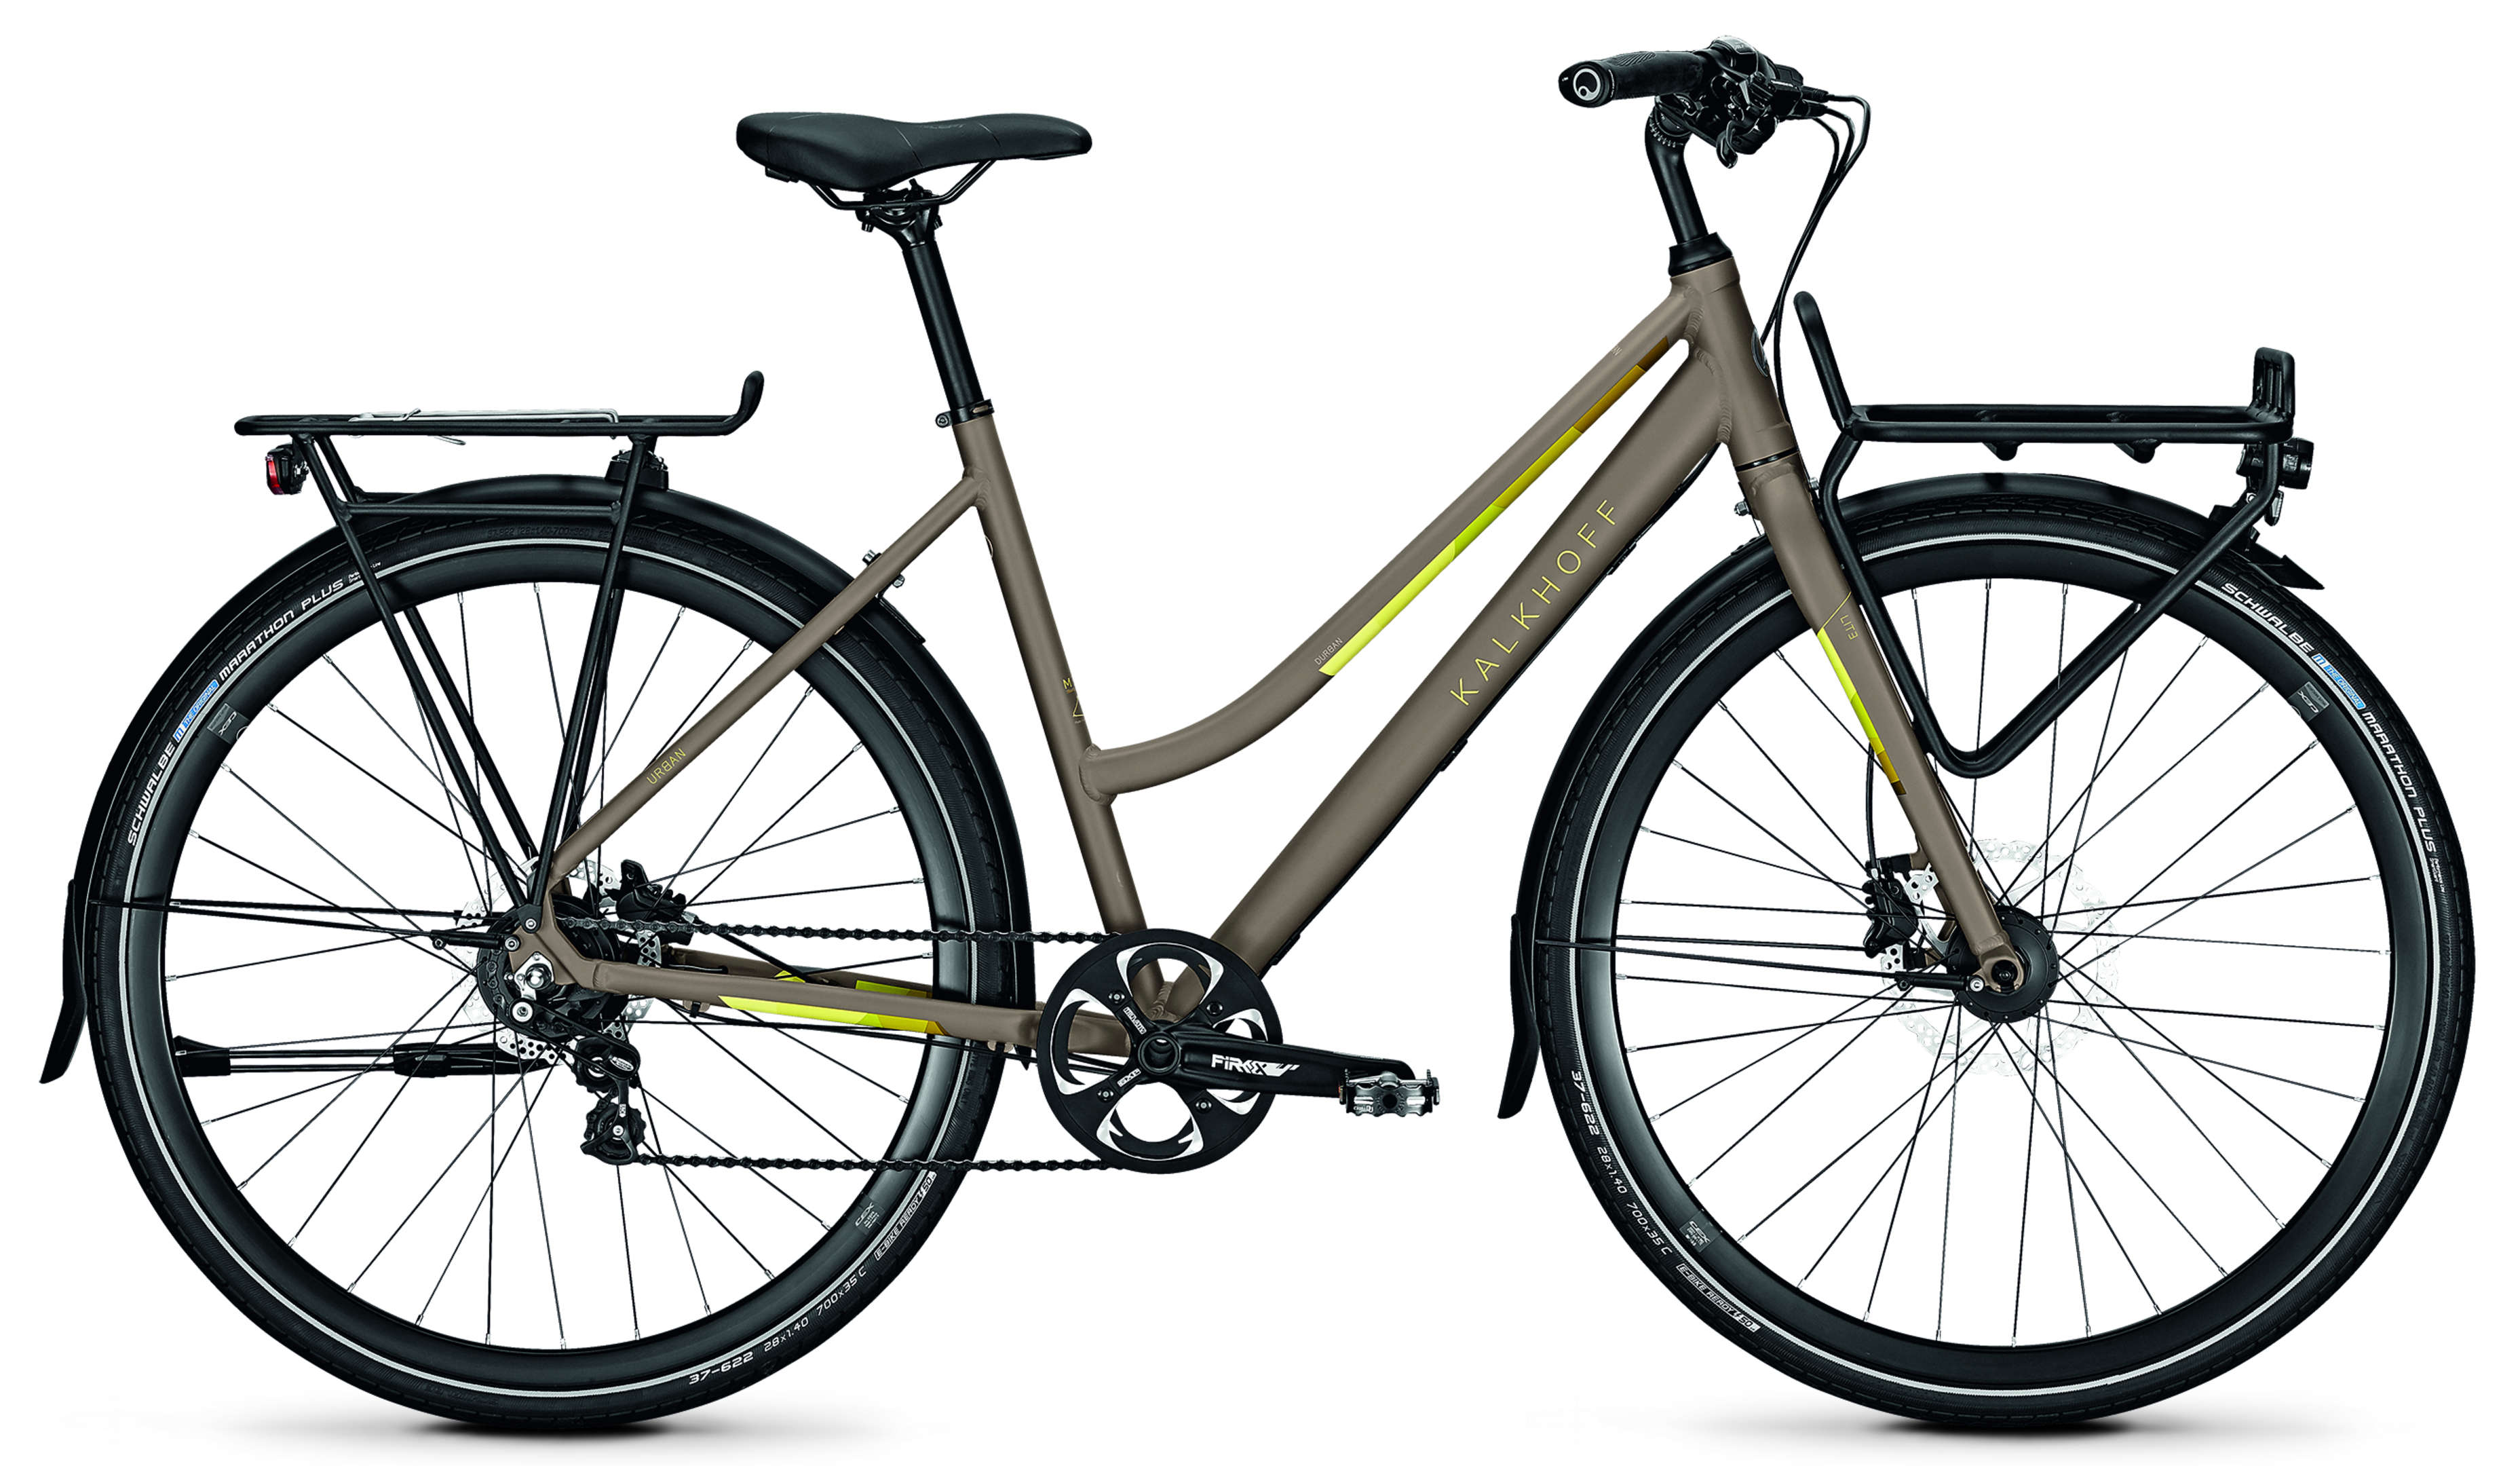 kalkhoff trekkingrad durban 8 8g 2017 eurorad bikeleasingeurorad bikeleasing. Black Bedroom Furniture Sets. Home Design Ideas